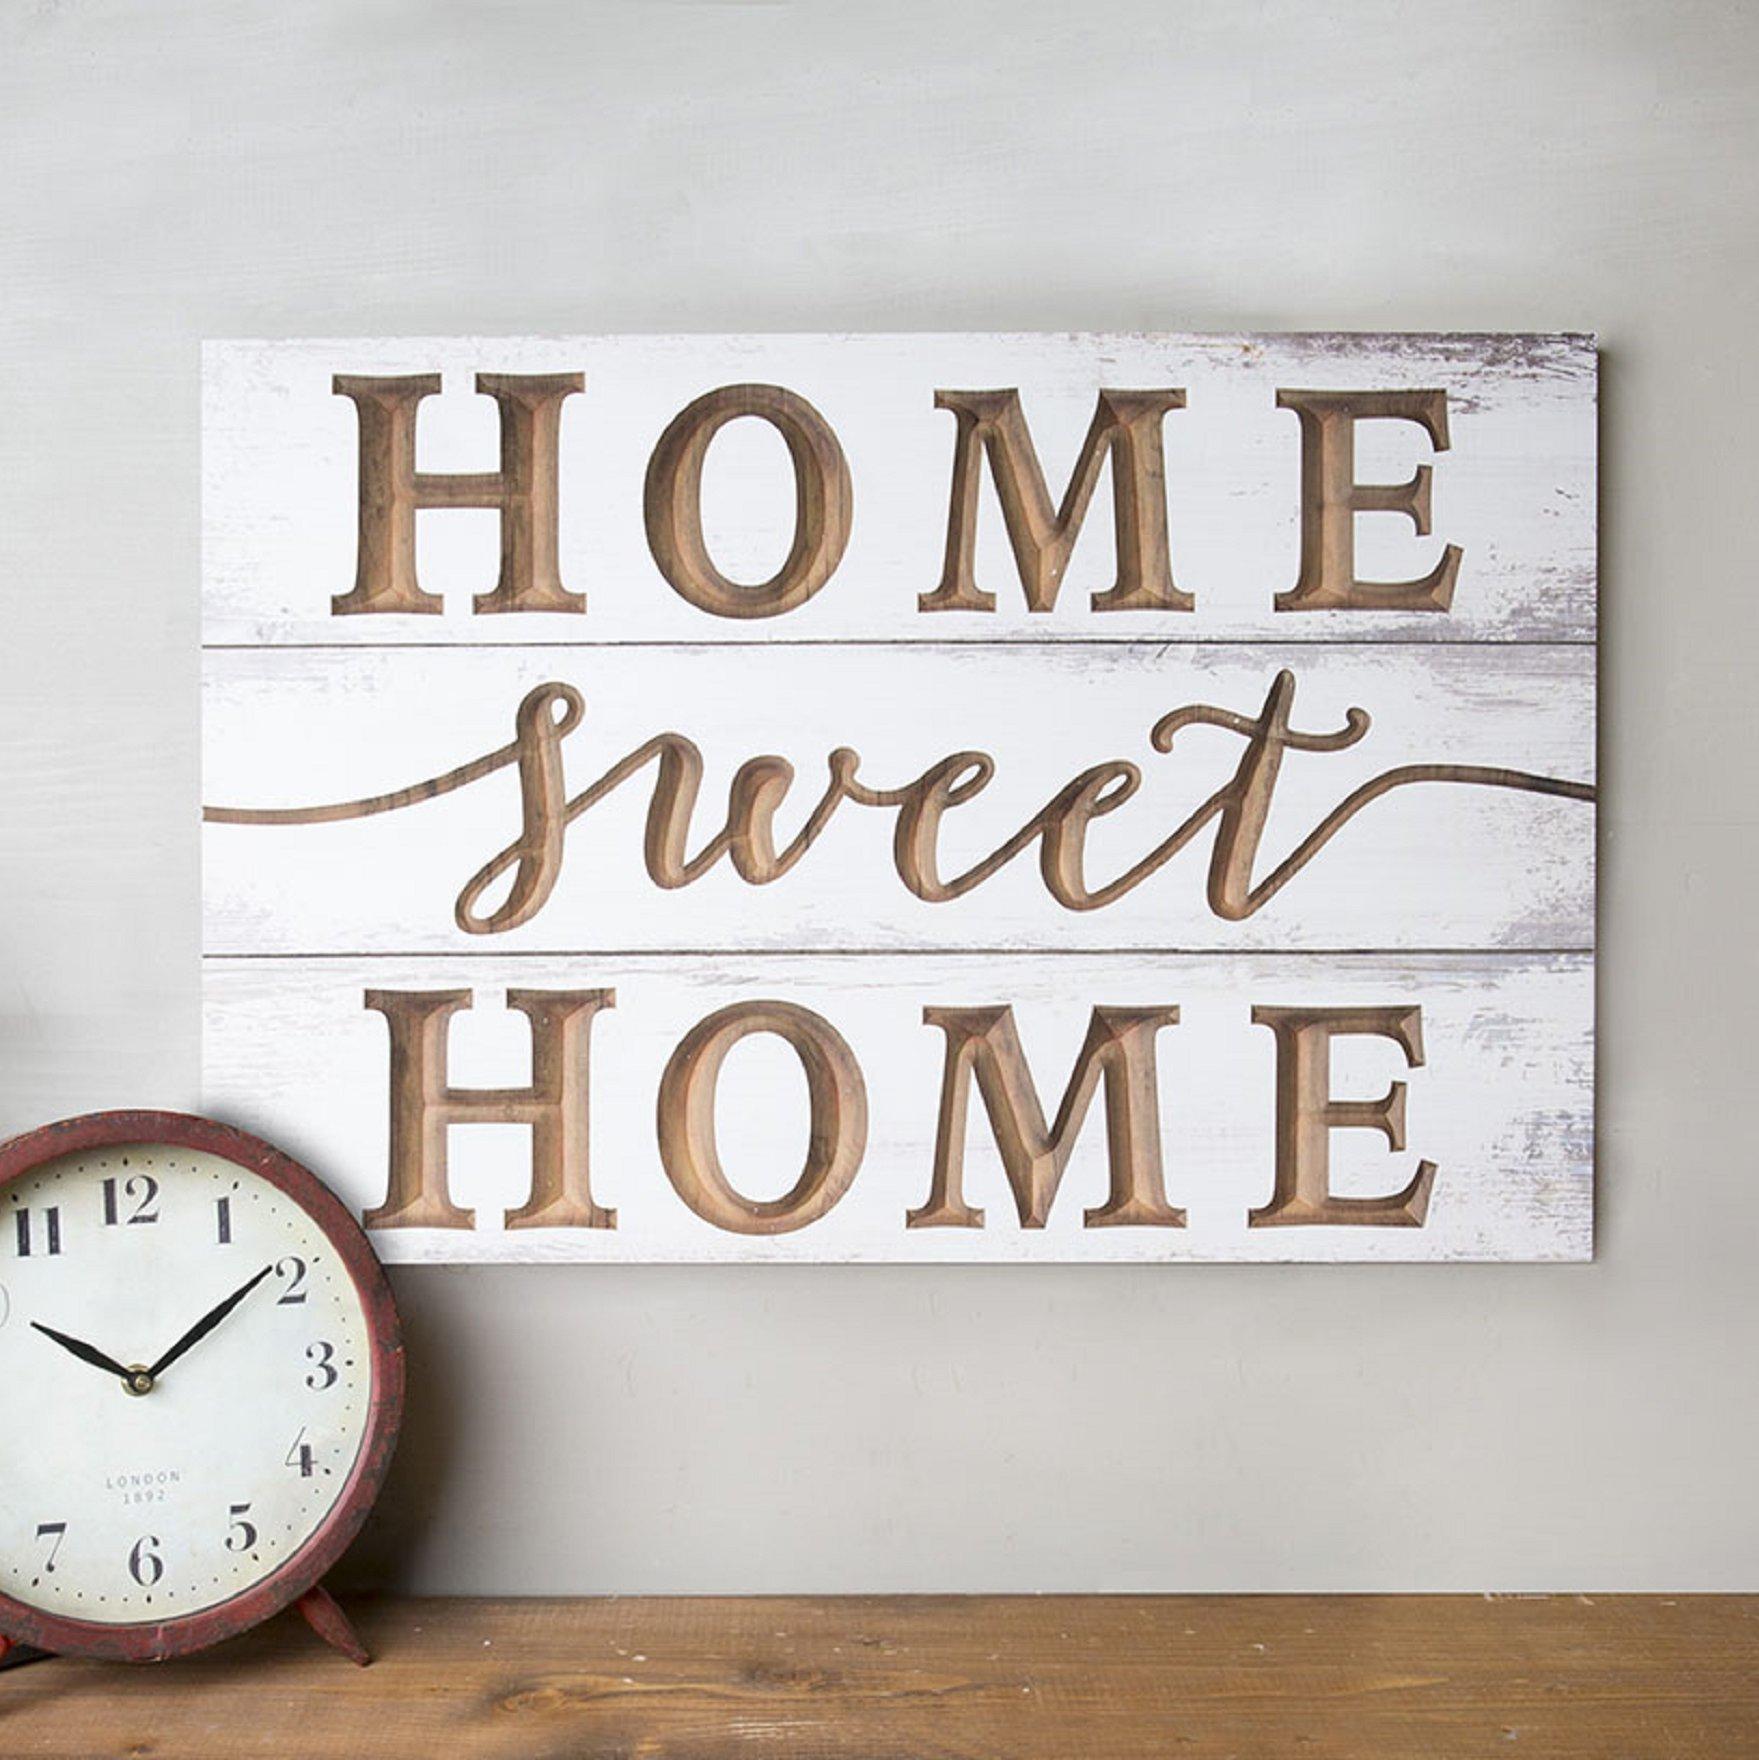 Home Sweet Home Wall Decor | Wayfair Inside Laser Engraved Home Sweet Home Wall Decor (View 3 of 30)